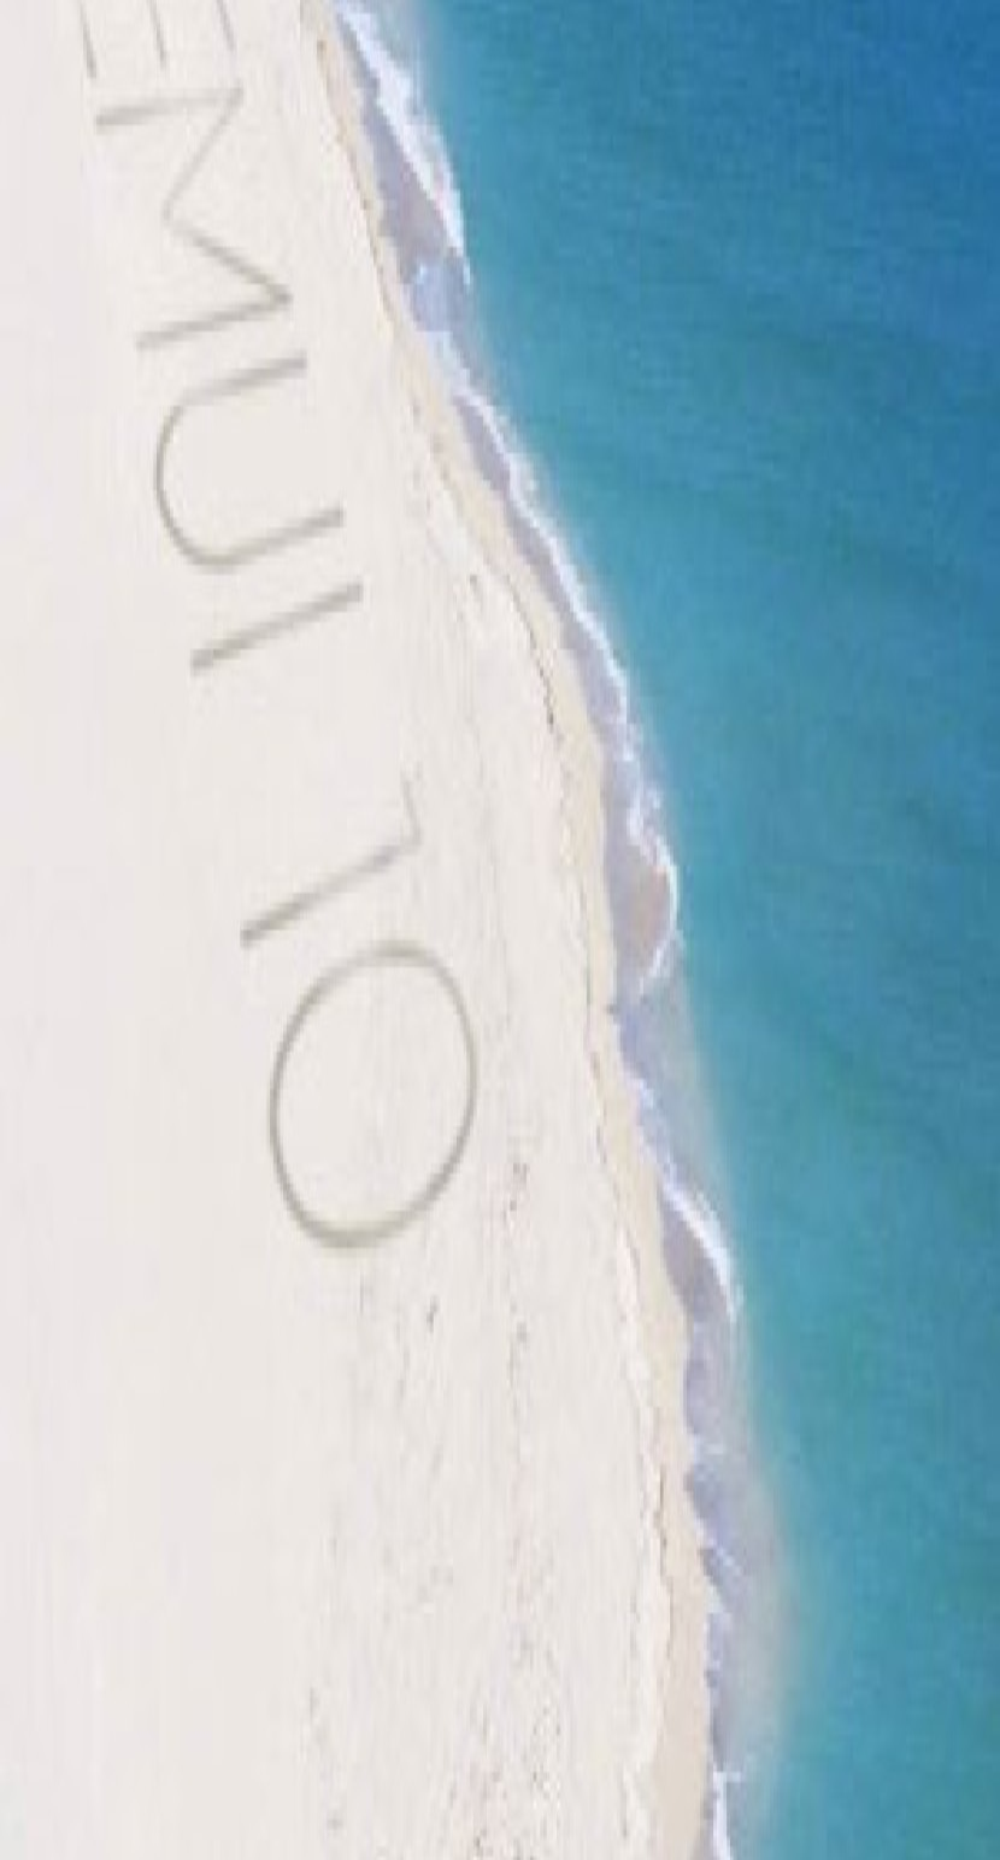 EMUI 10: Επίσημη παρουσίαση στις 9 Αυγούστου από τη Huawei